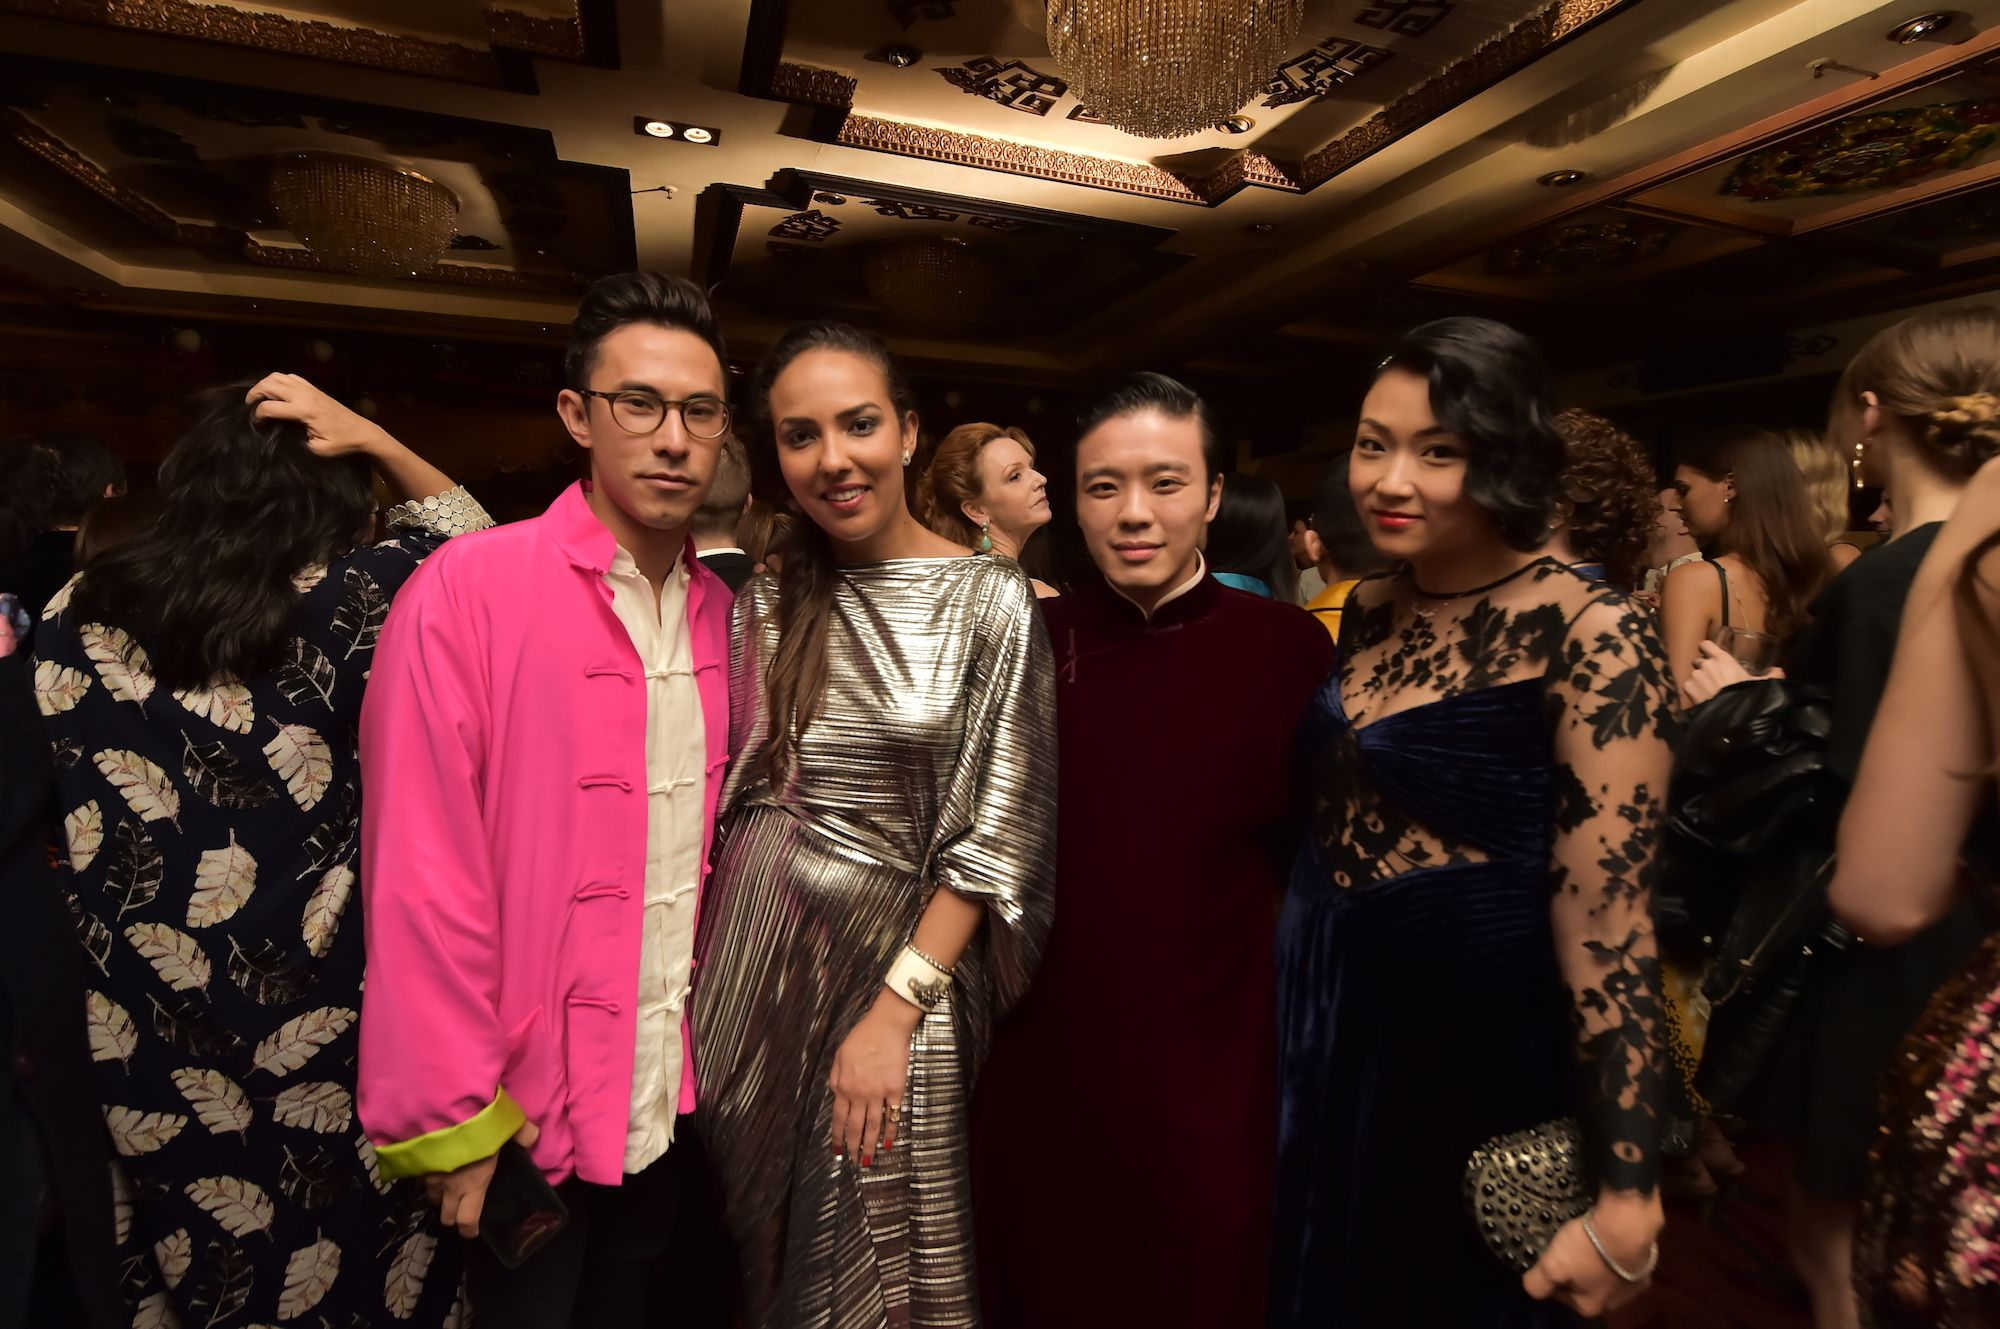 Edward Tang, Princess Alia Al-Senussi, Jonathan Cheung, Veronica Chou